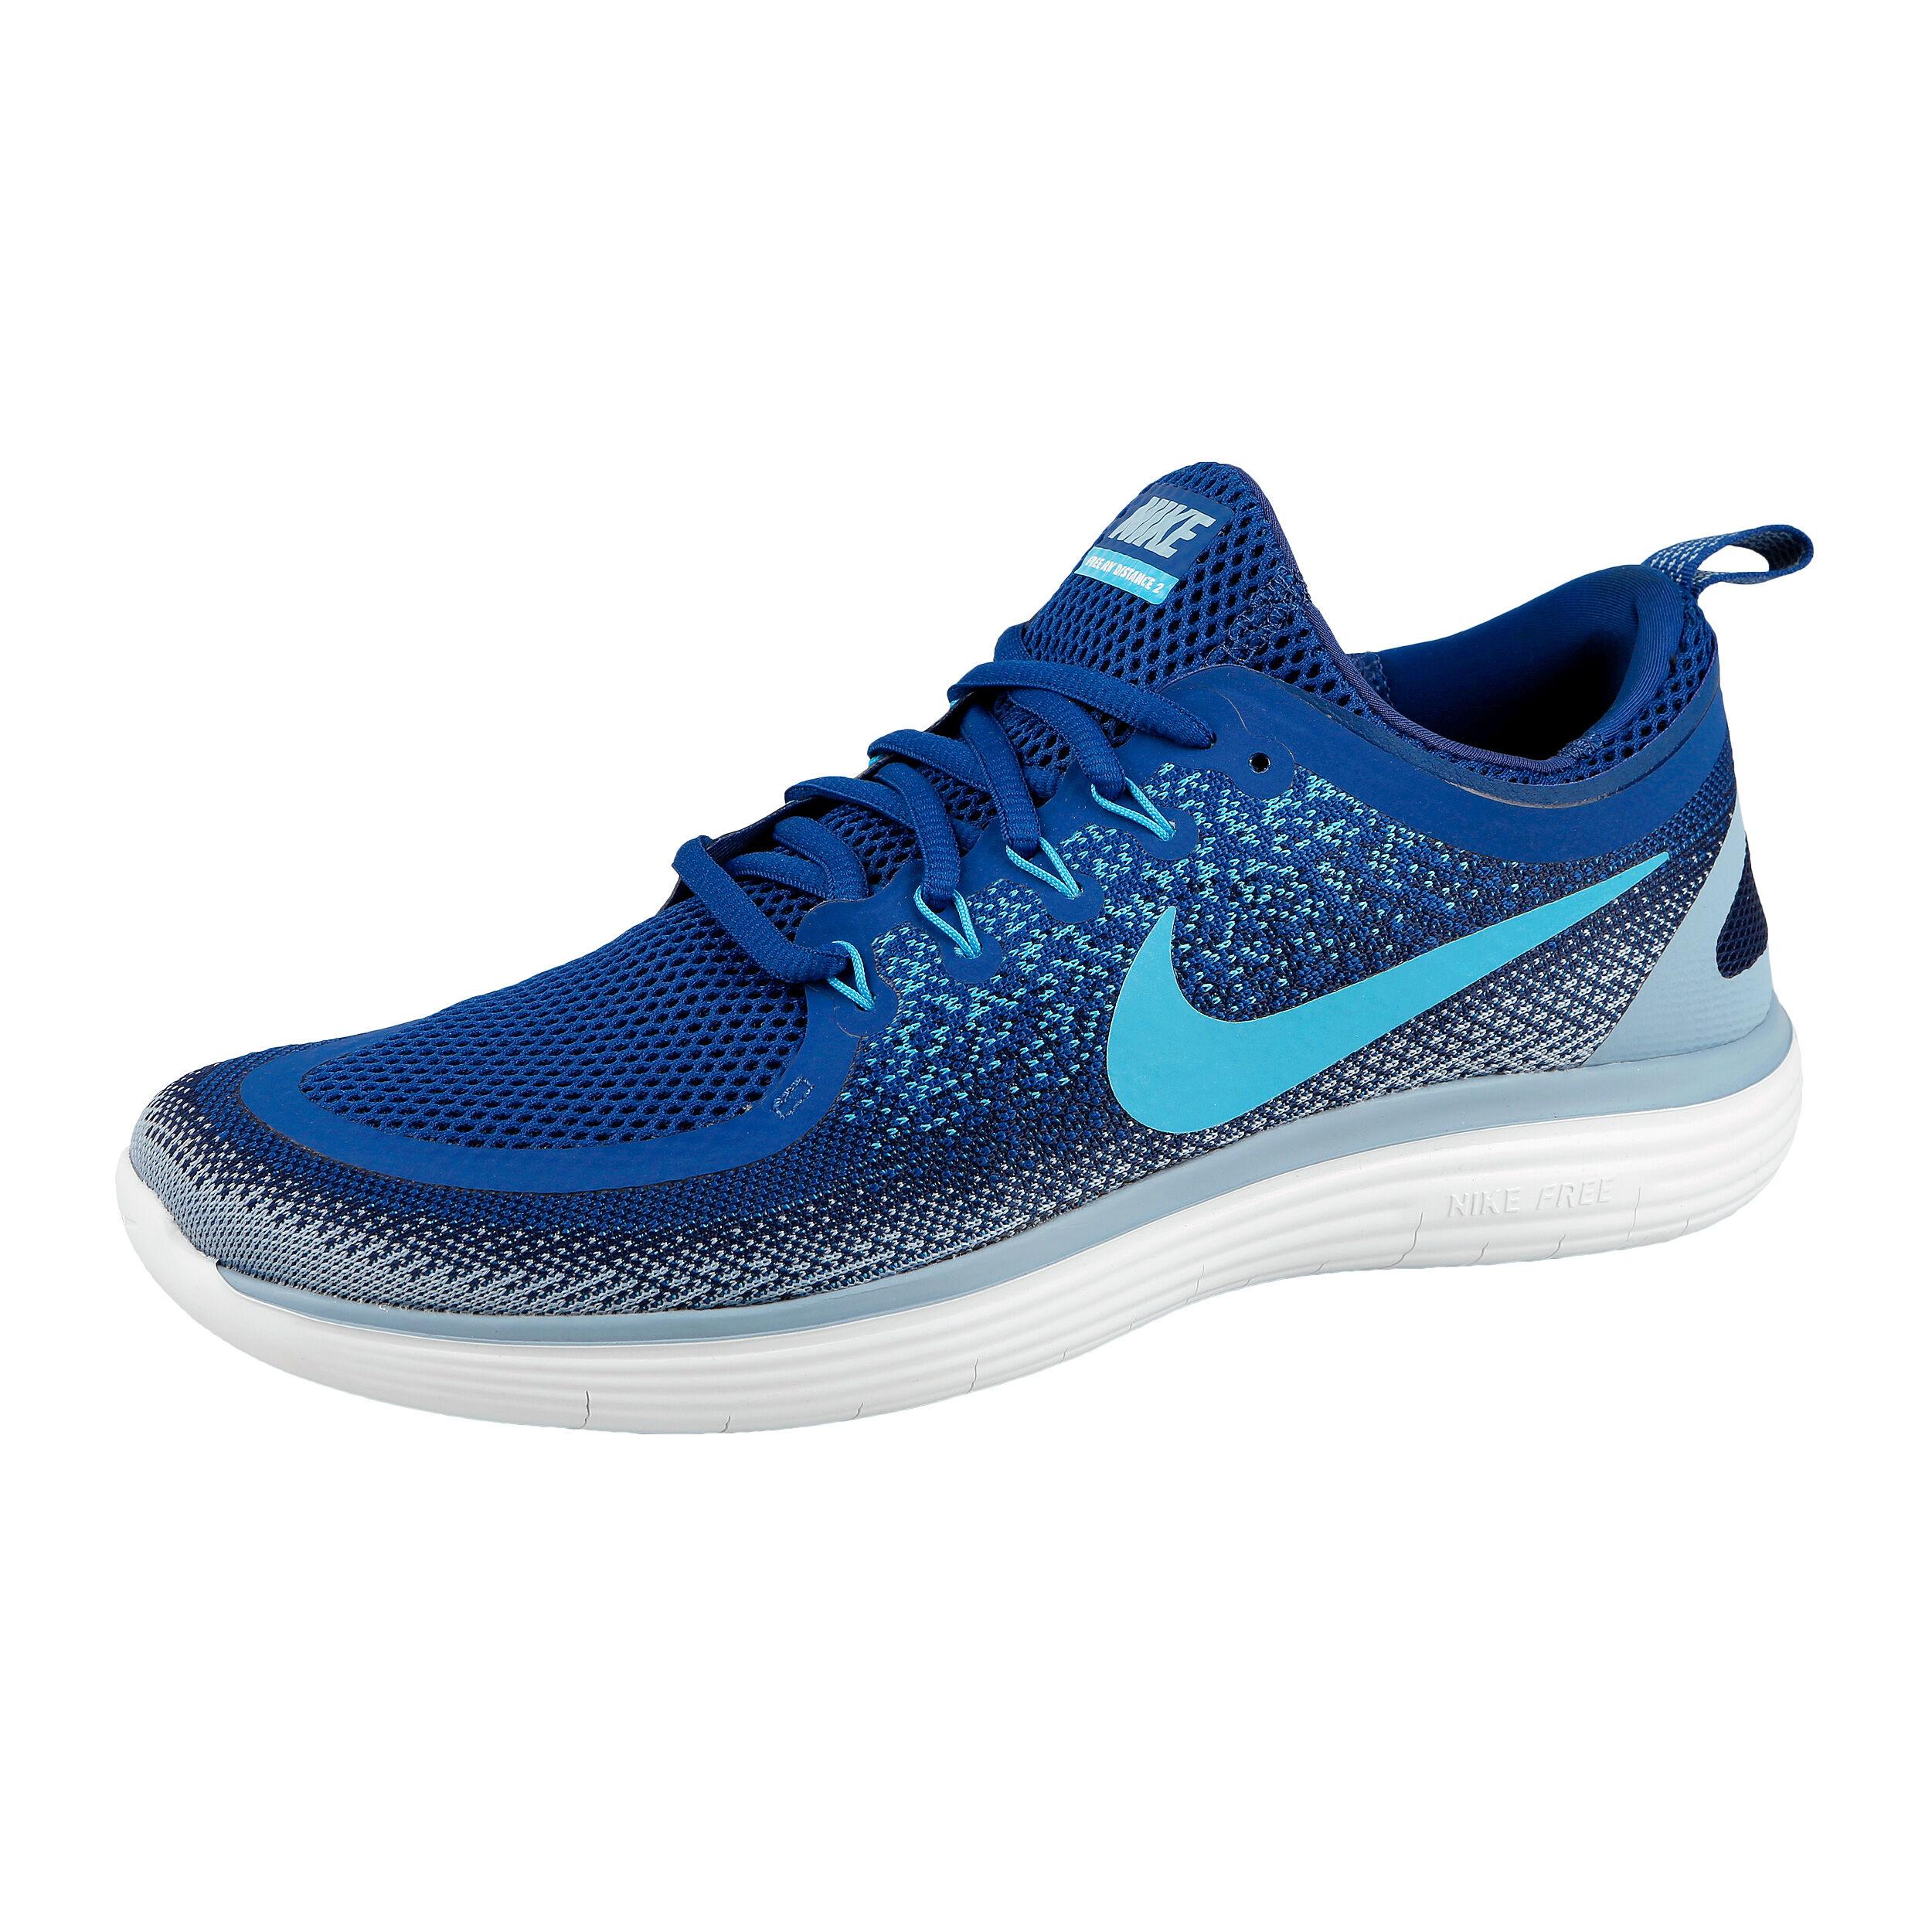 Nike Free Run Distance 2 Natural Running Schuh Herren Blau, Hellblau